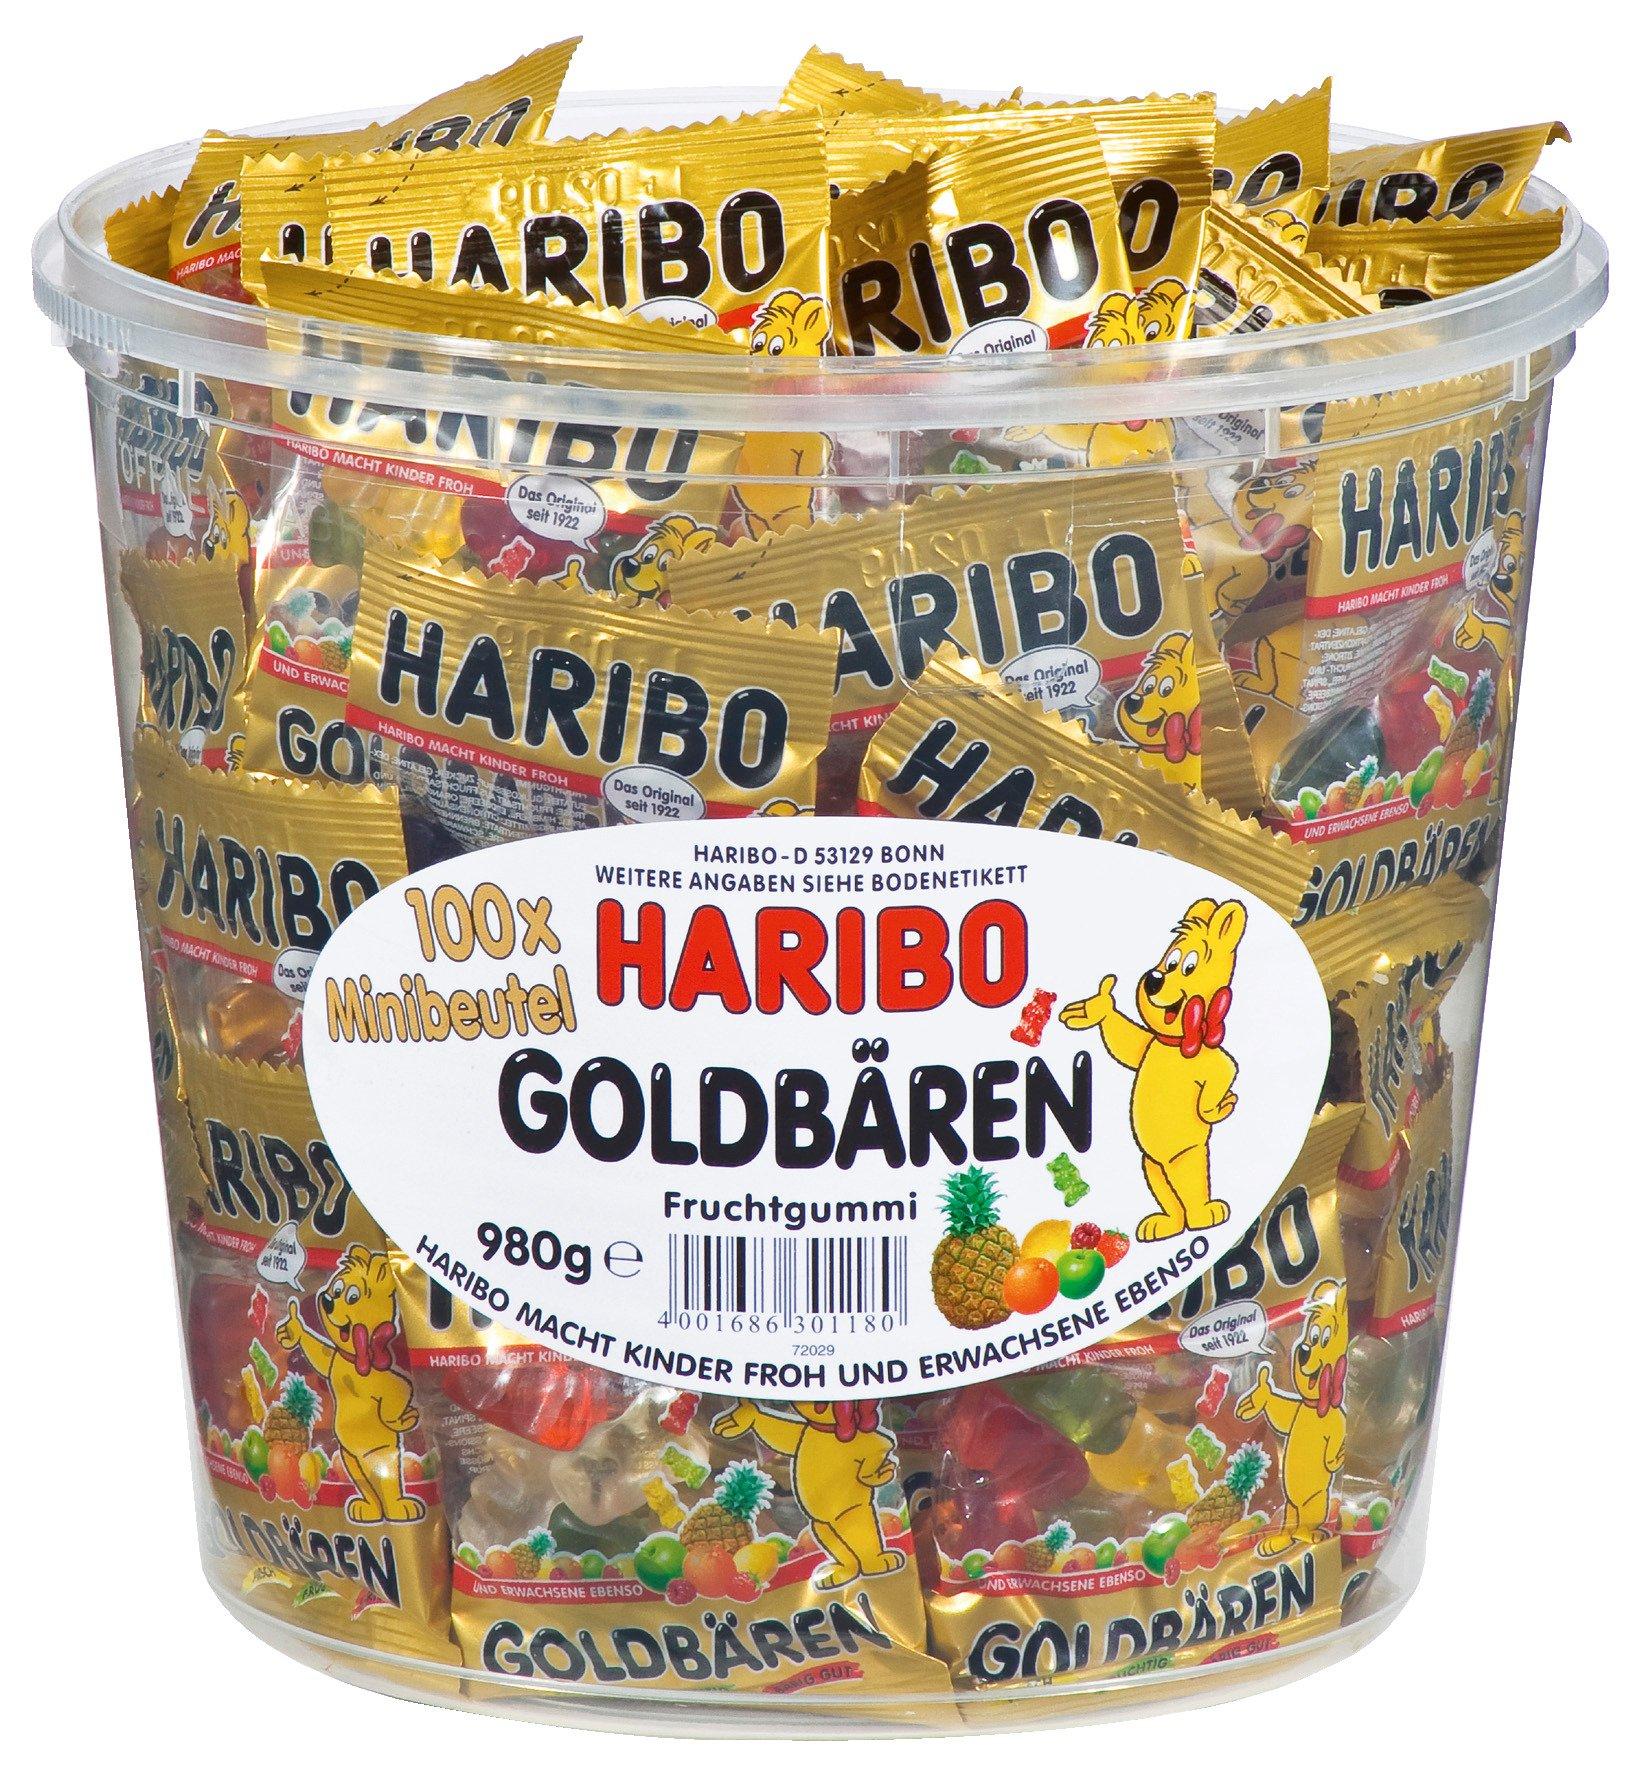 Haribo Mini Goldbaren ( Haribo mini Gold Bears ) , 100x minibags, 980g Tub